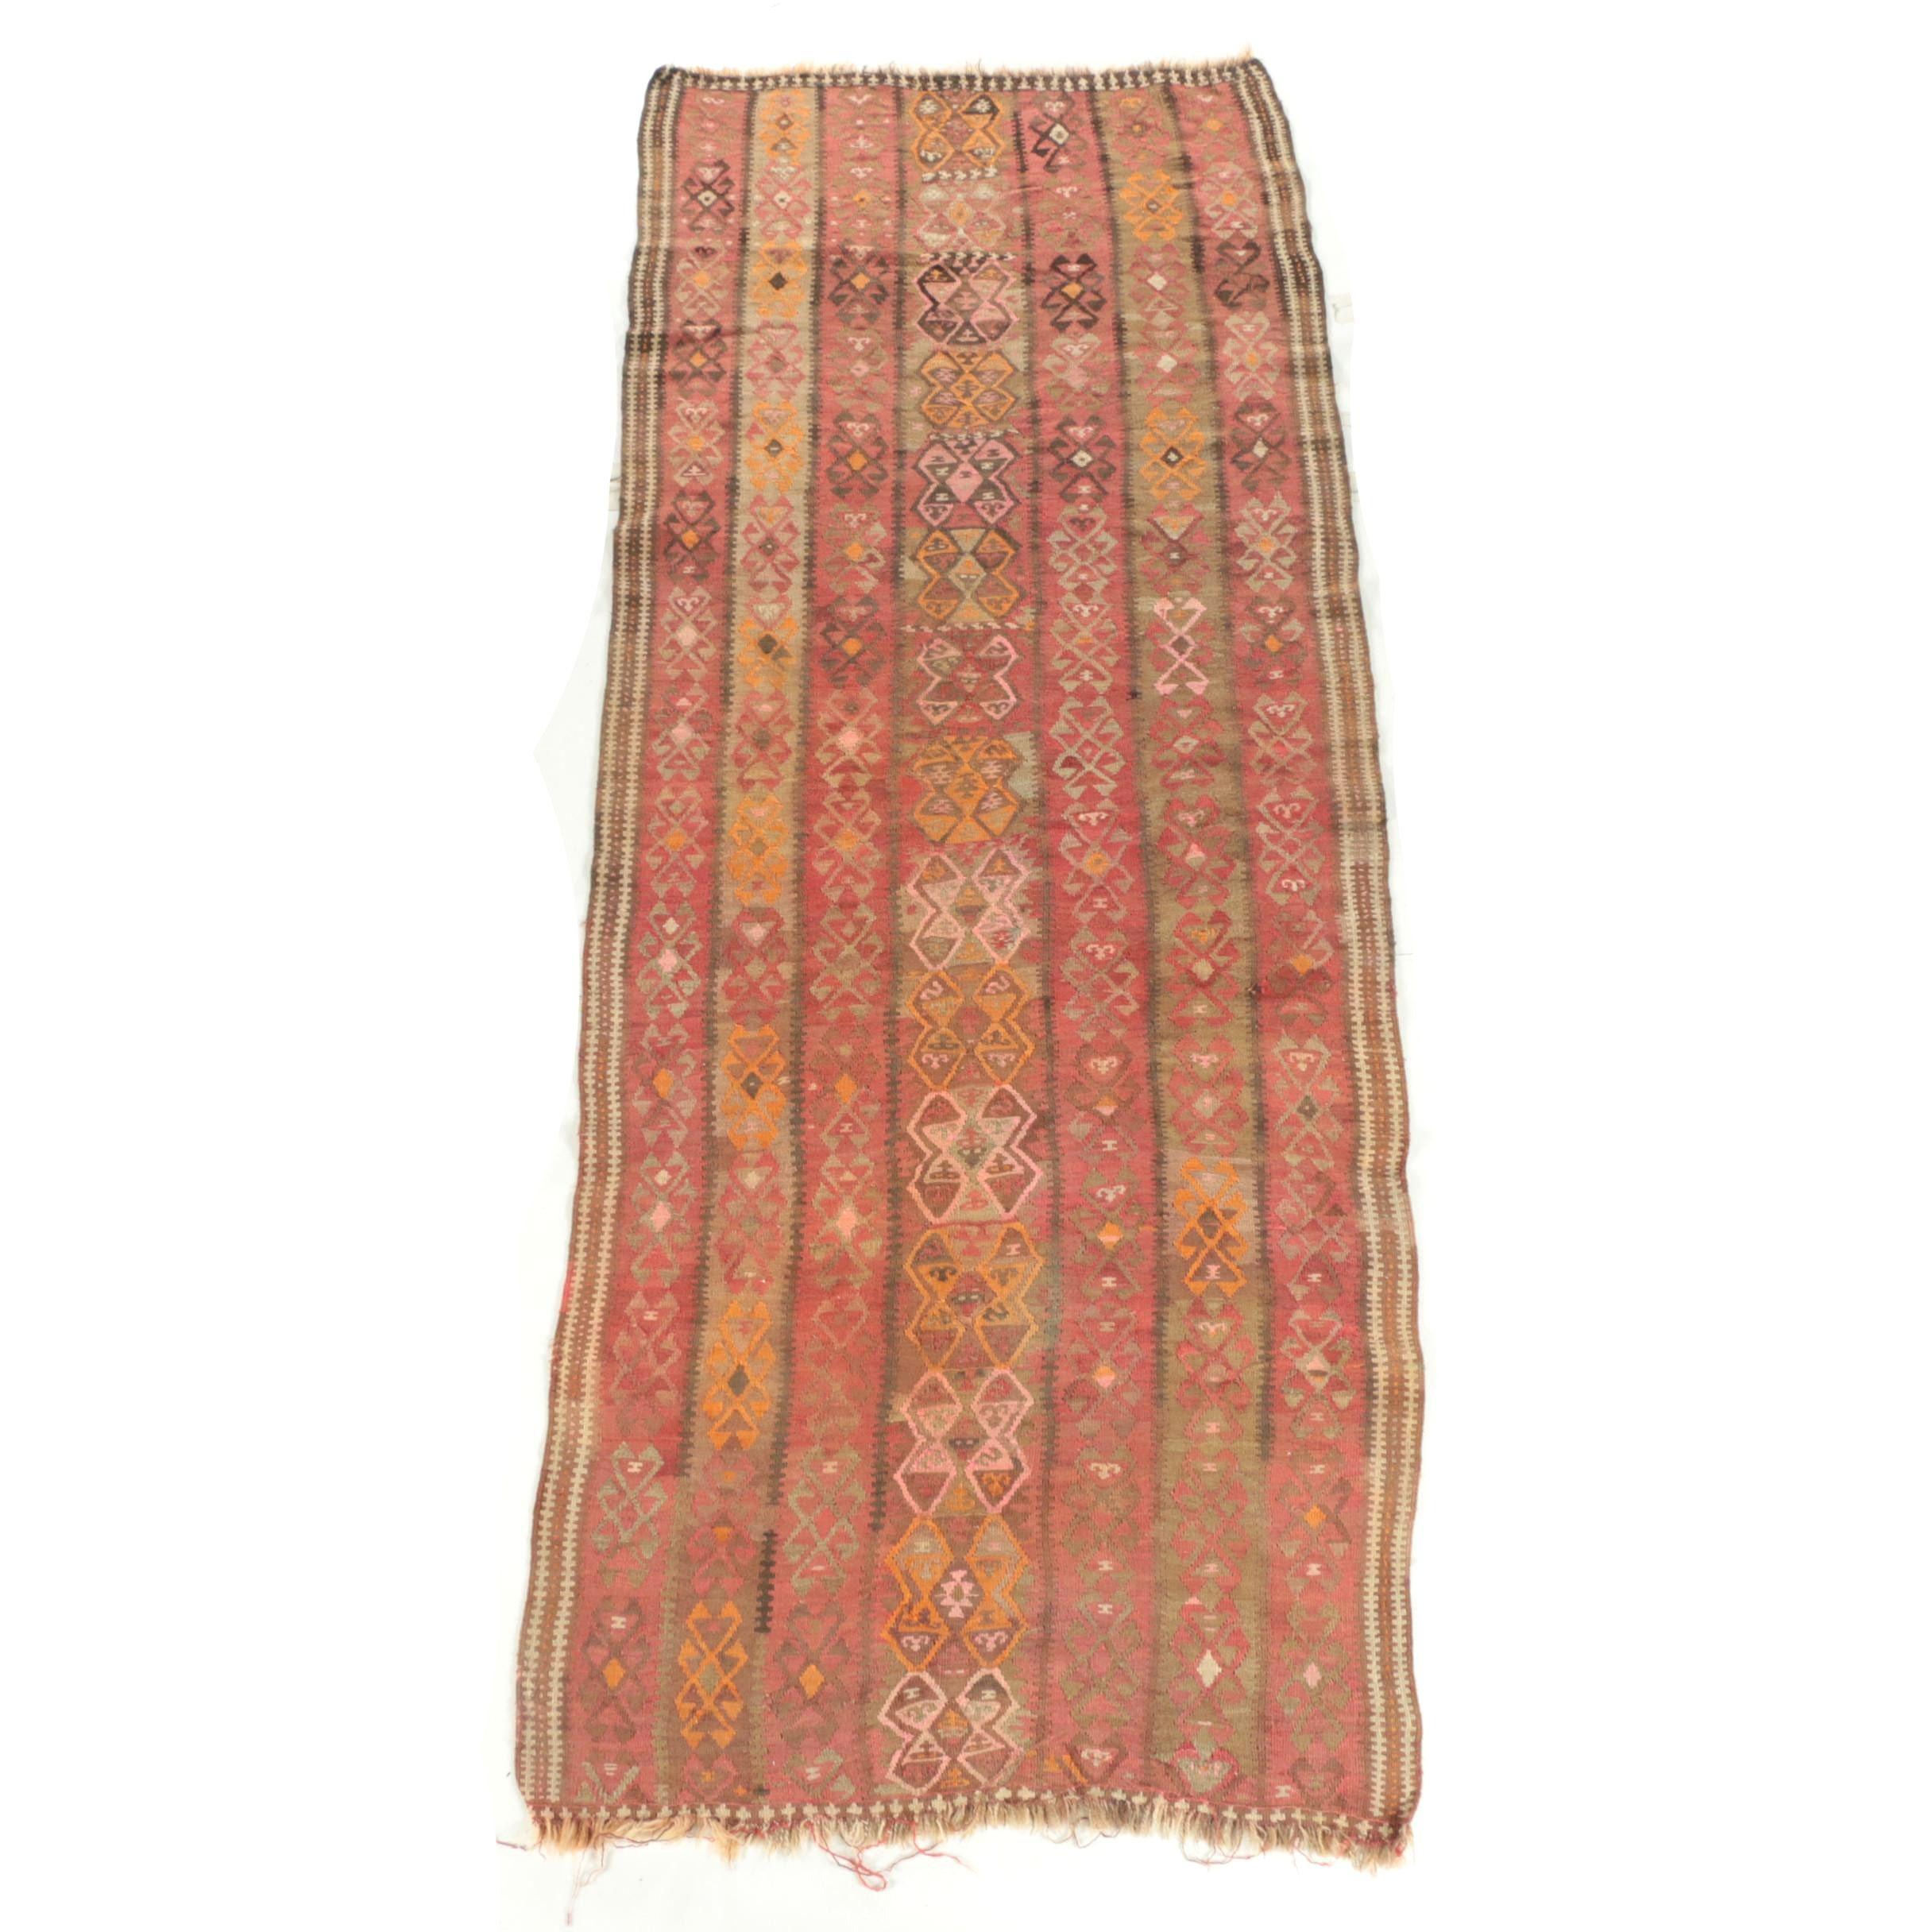 Semi-Antique Handwoven Anatolian Wool Kilim Long Rug